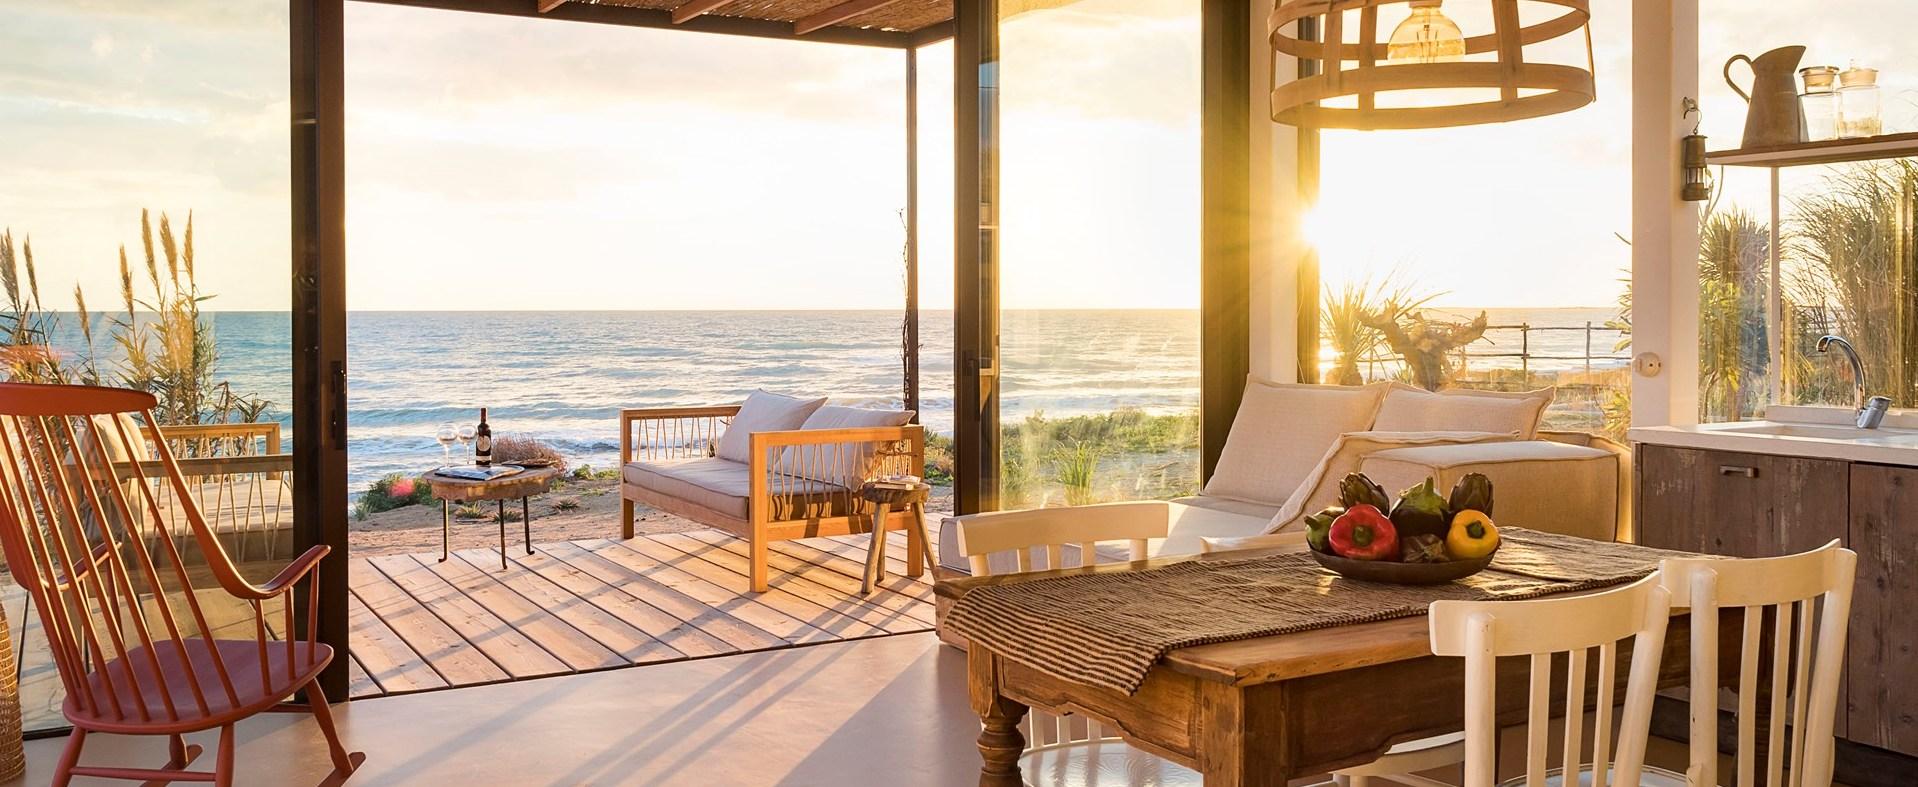 romantic-villa-holiday-sicily